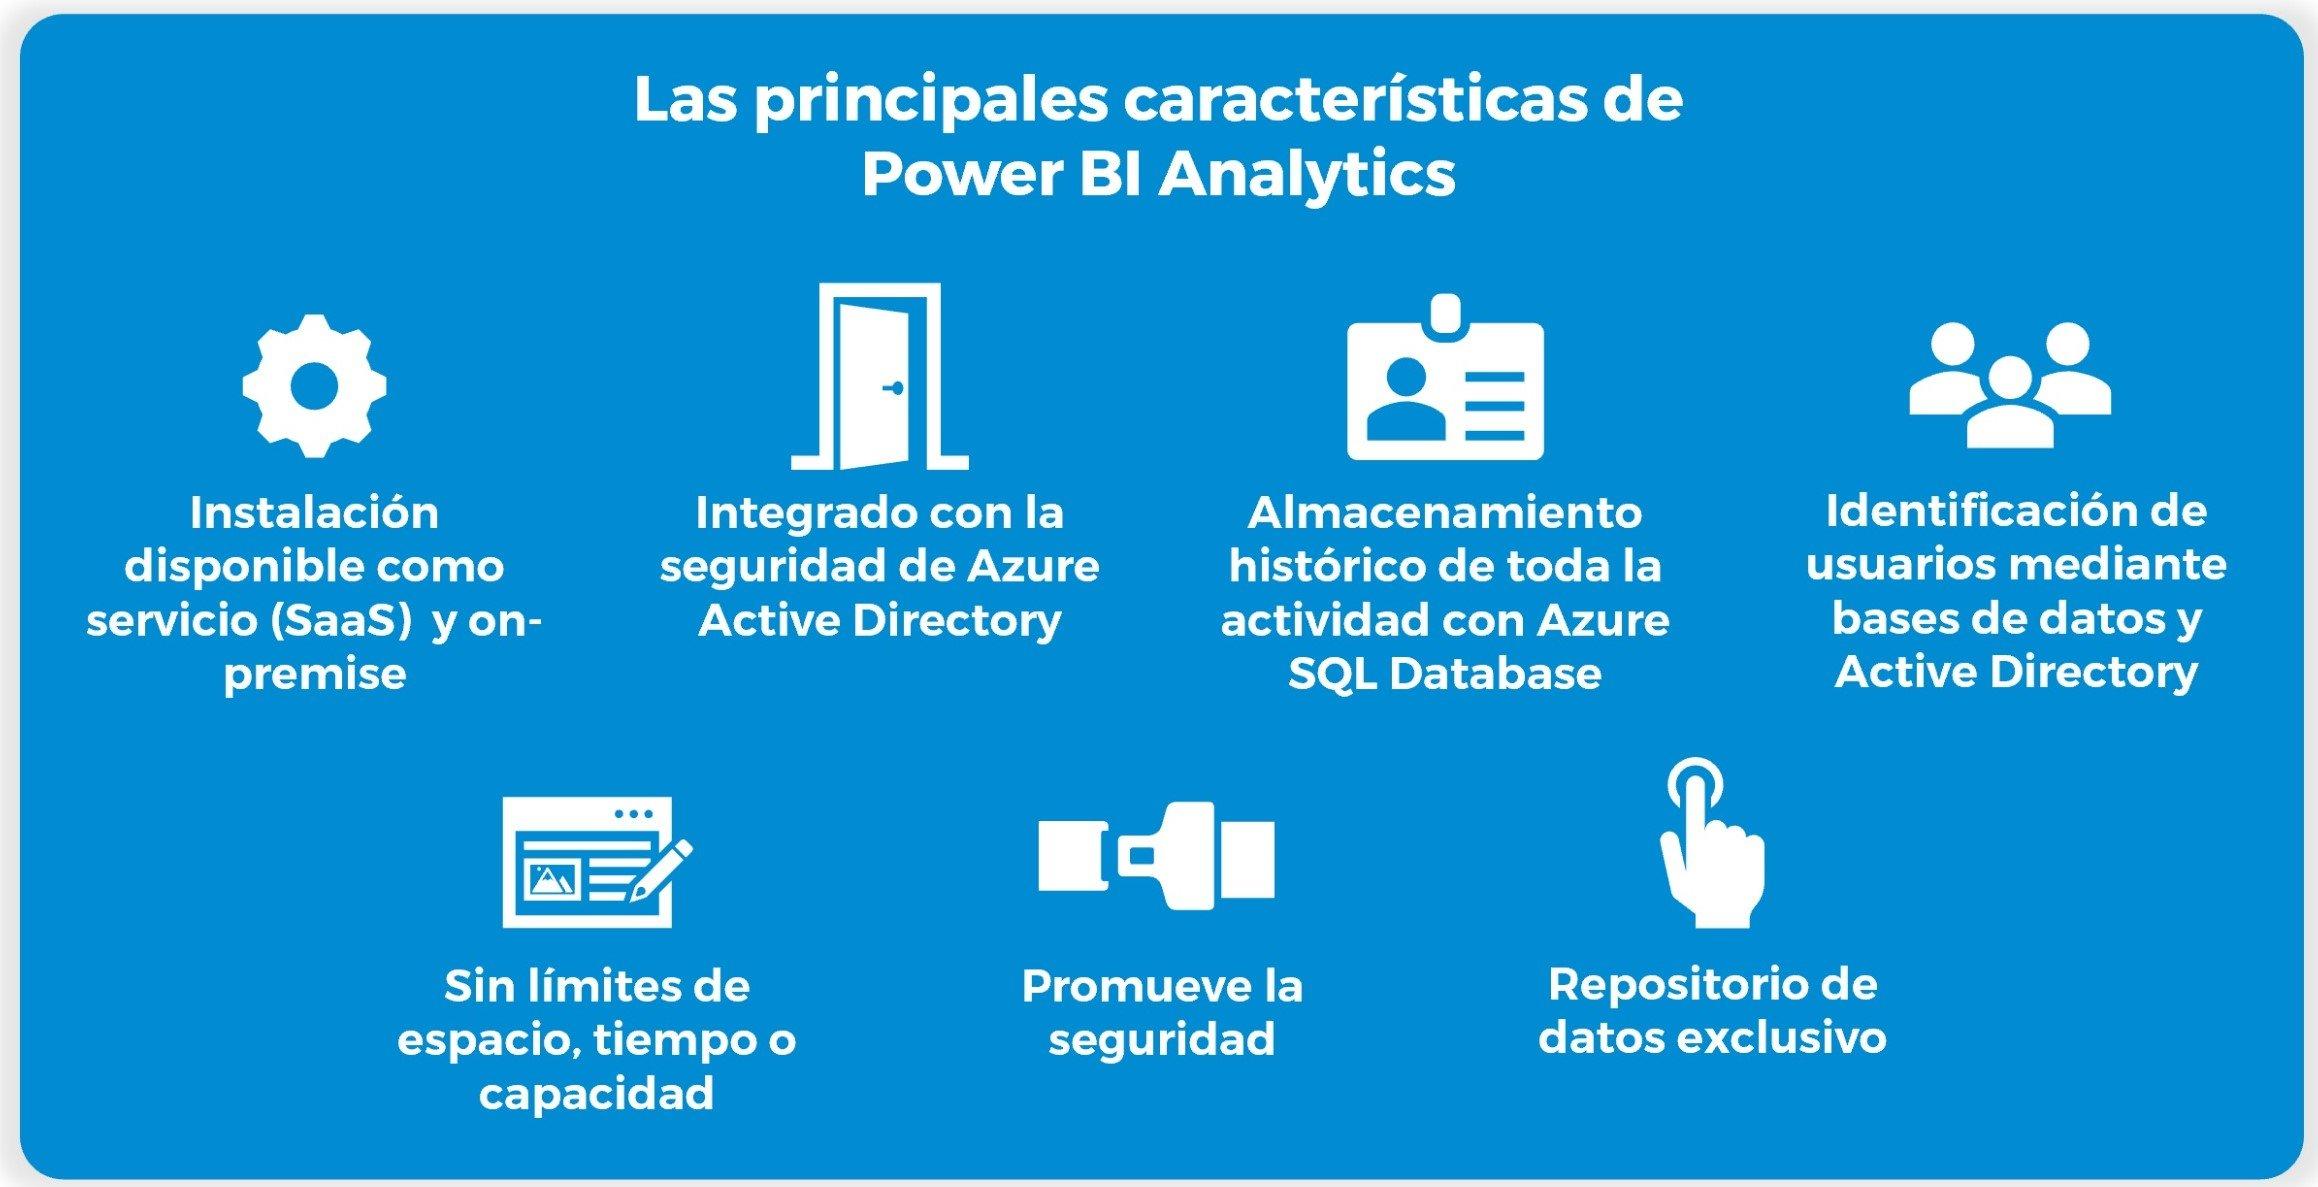 principales-características-power-bi-analytics